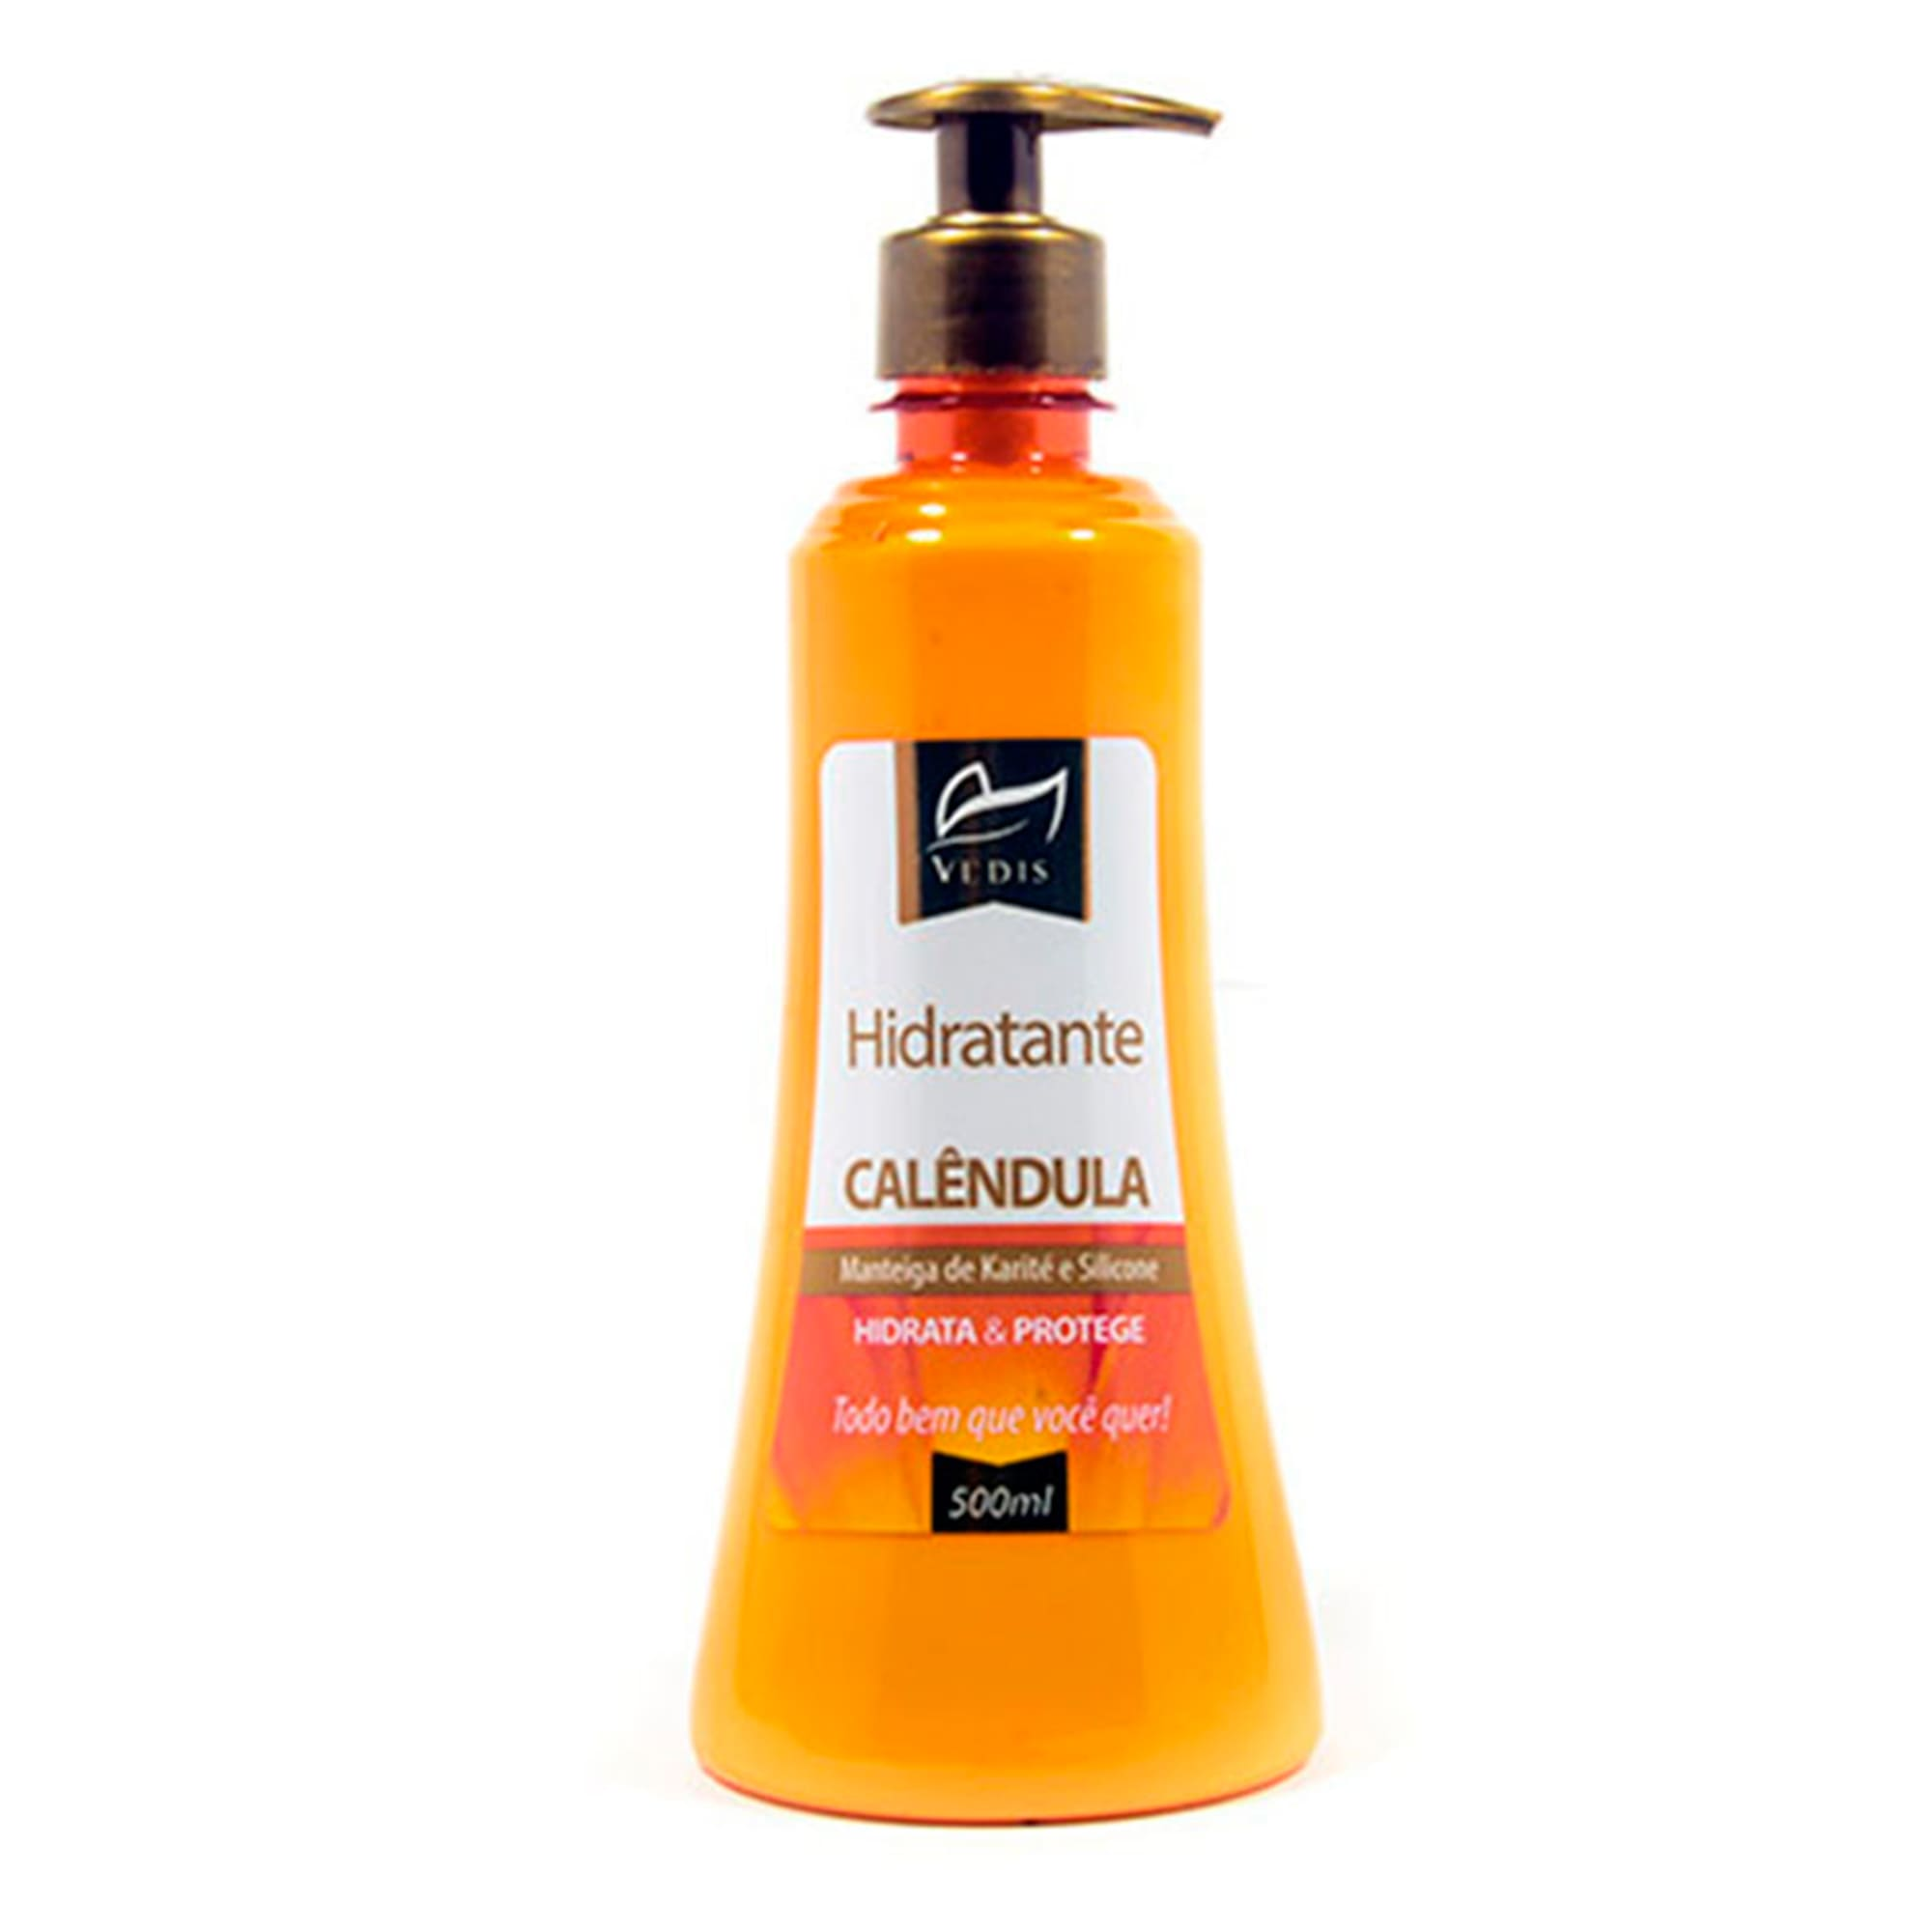 Creme Hidratante com Calêndula 500ml - Vedis